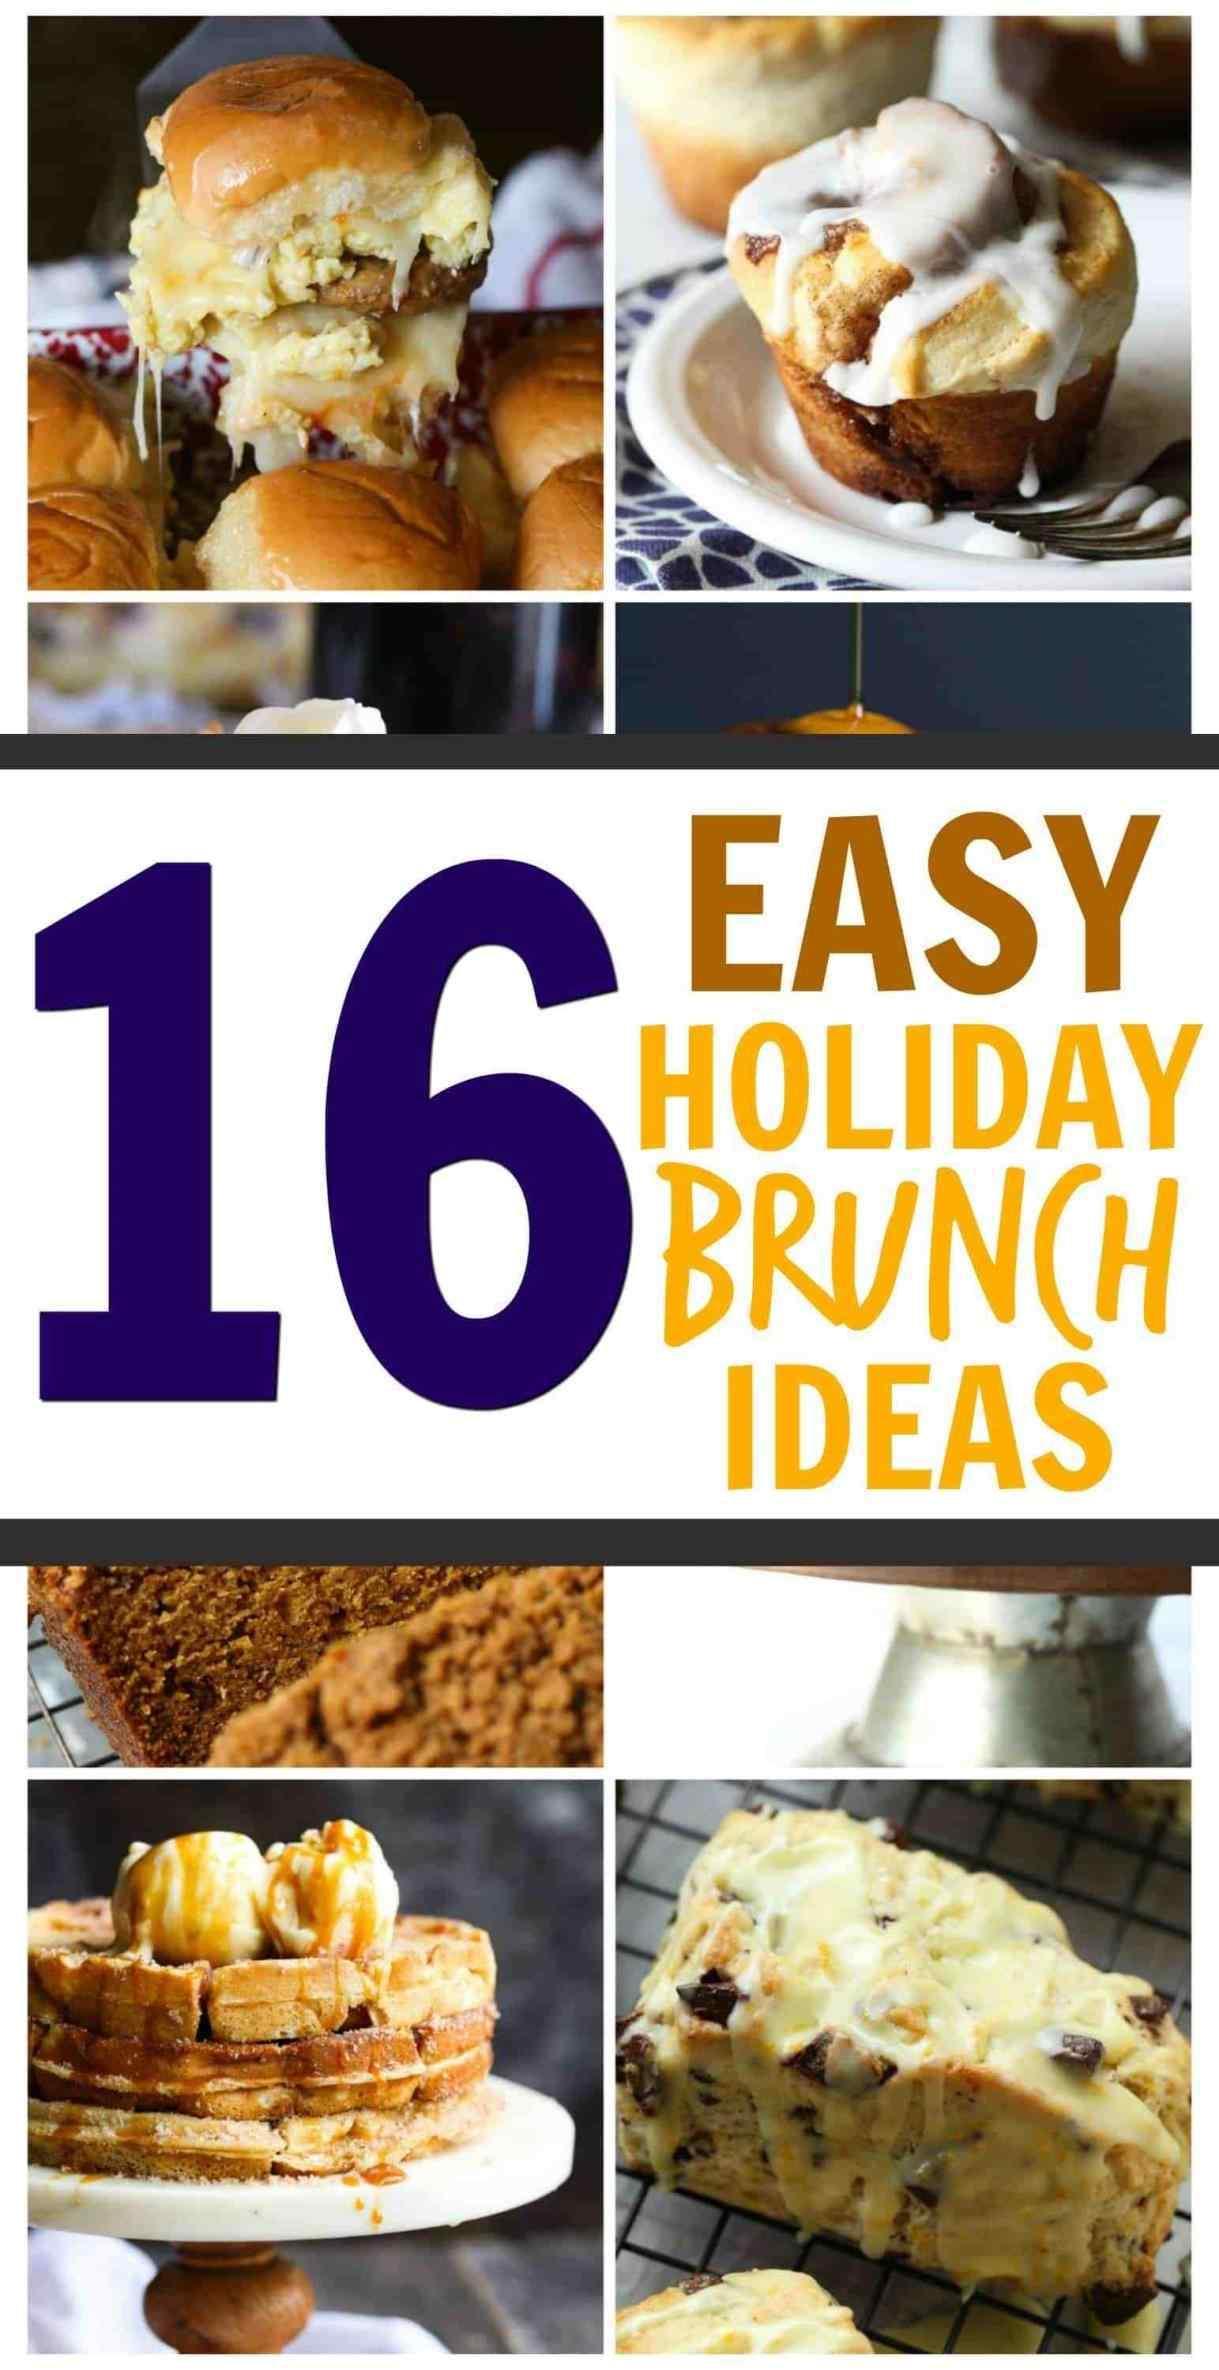 Bites idea food meanderingsrhfoodmeanderingscom. Brunch clipart breakfast potluck